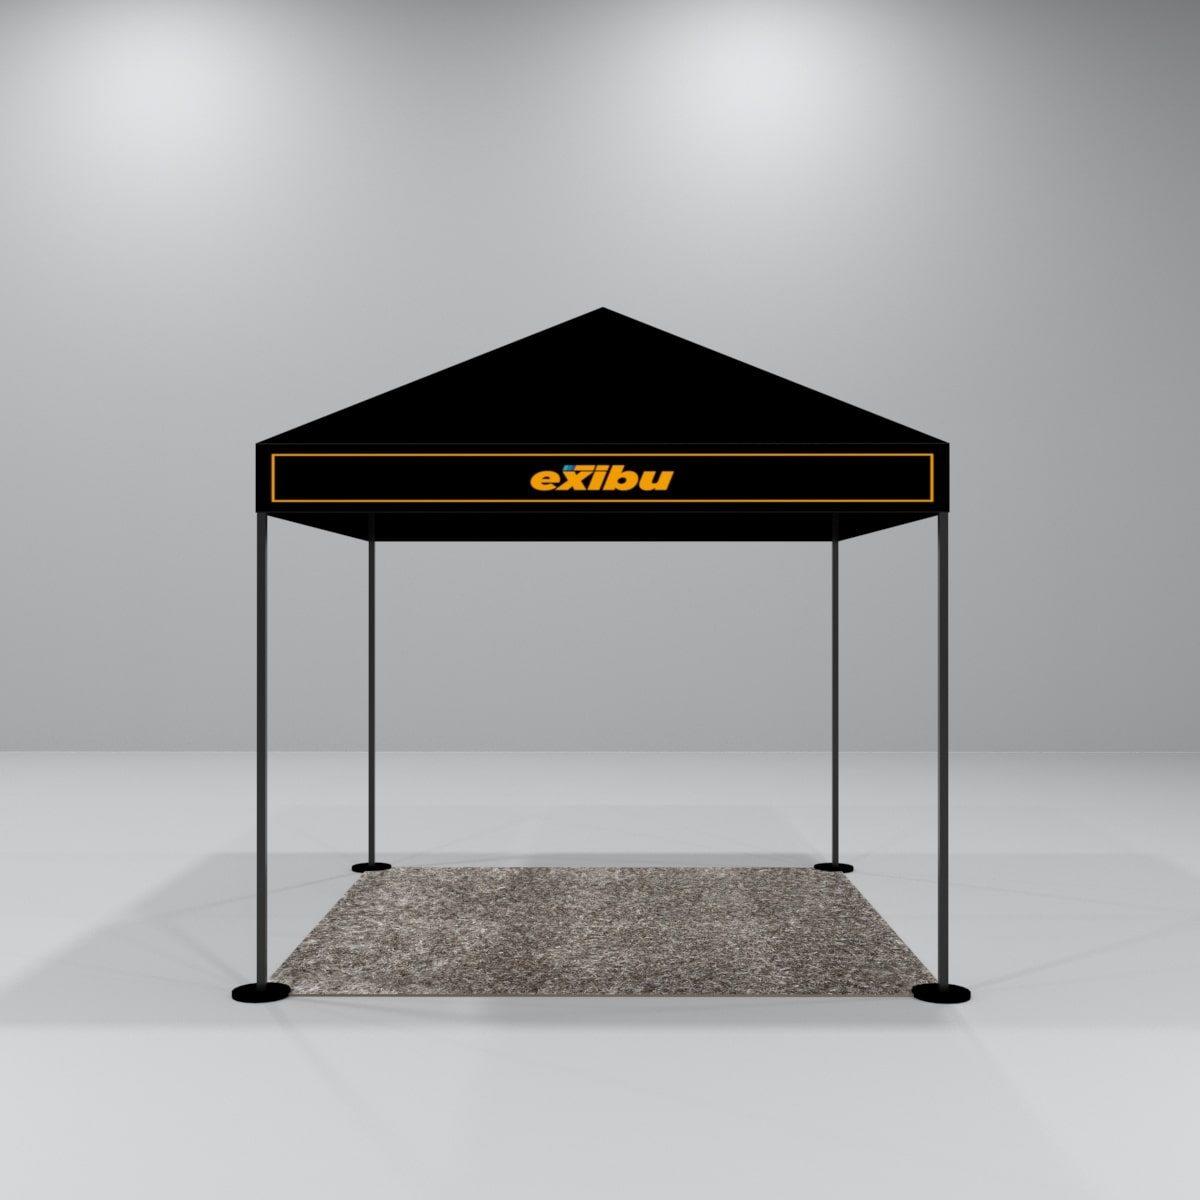 Kit 2 – 3X3 M Gazebo With Facia Printing